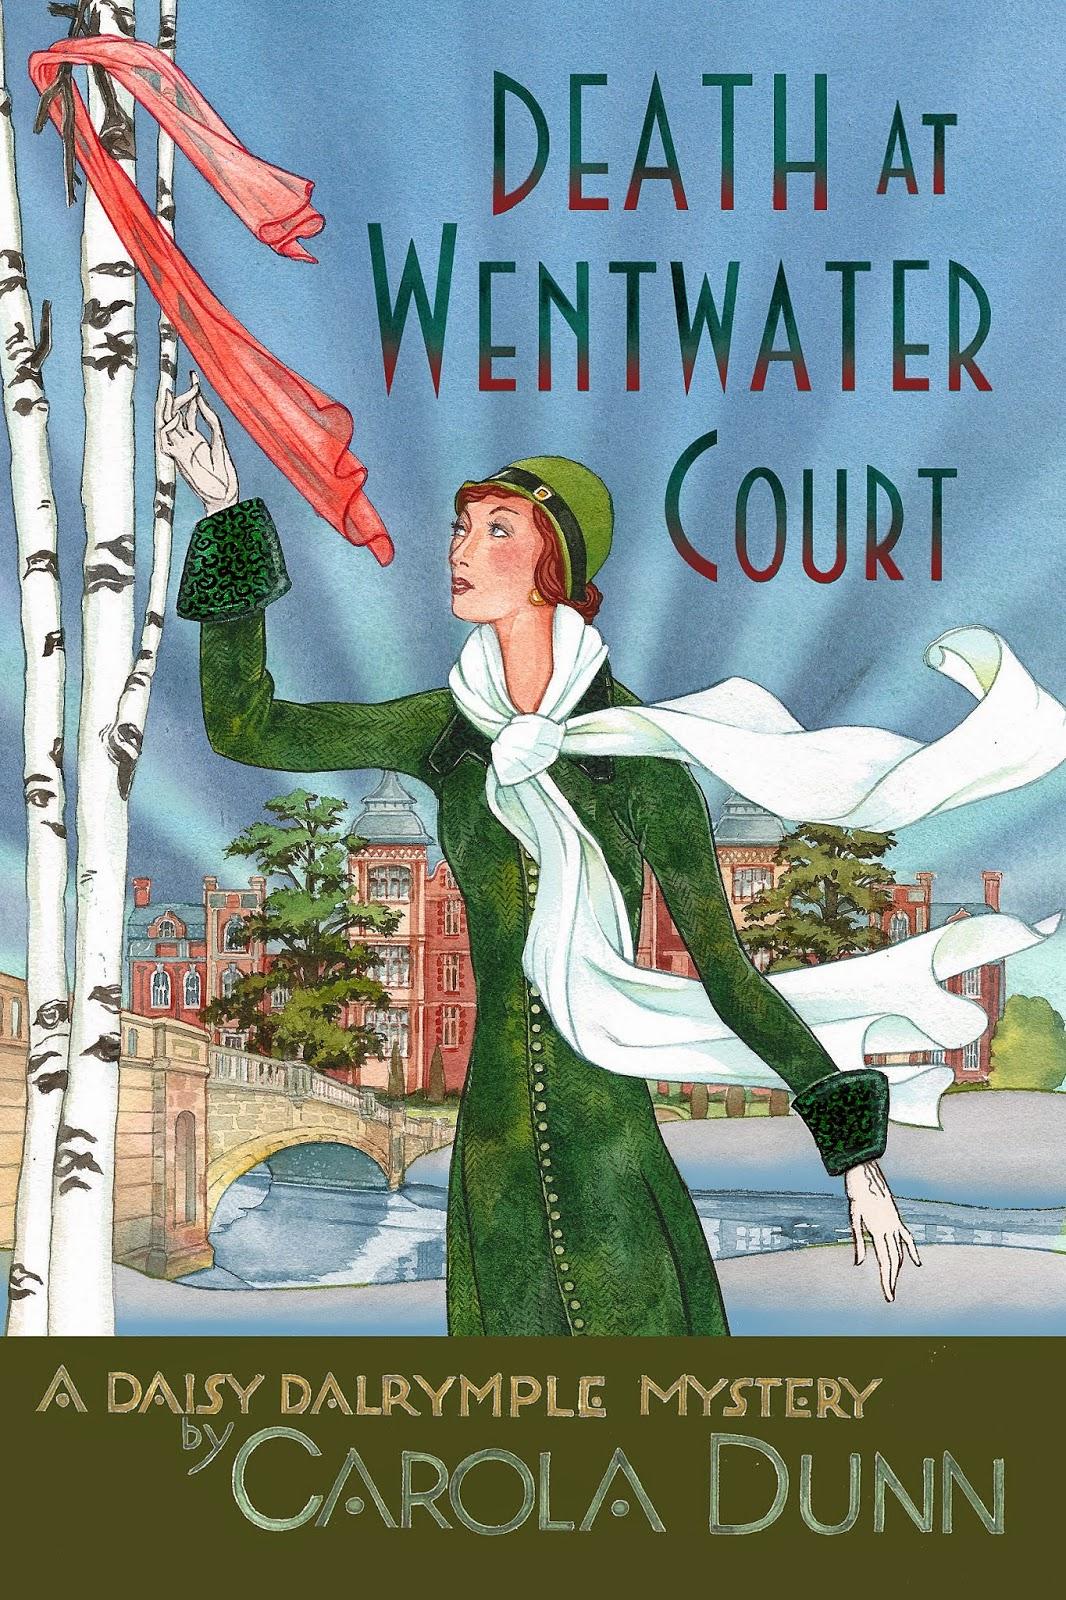 http://www.amazon.com/Death-Wentwater-Court-Dalrymple-Mysteries/dp/1250060796/ref=sr_1_1?s=books&ie=UTF8&qid=1426530103&sr=1-1&keywords=death+at+wentwater+court